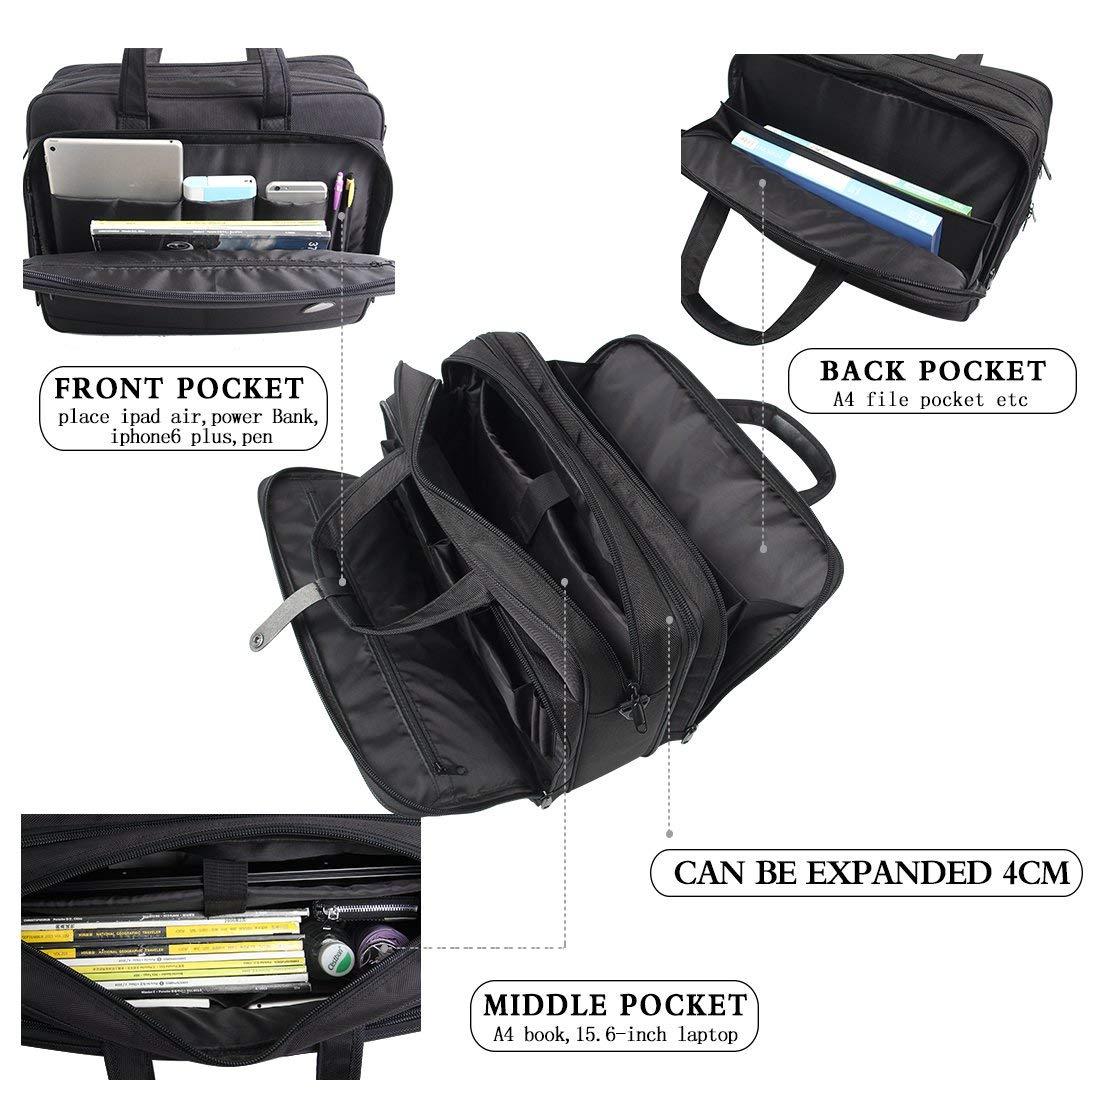 18-18.5 inch Laptop Bag,Water Resisatant Business Laptop Briefcase,Expandable High Capacity Shoulder Bag,Nylon Multi-Functional Shoulder Messenger Bag for Men Fits 17.3 inch Loptop,Computer,Tablet by LYALPH (Image #4)